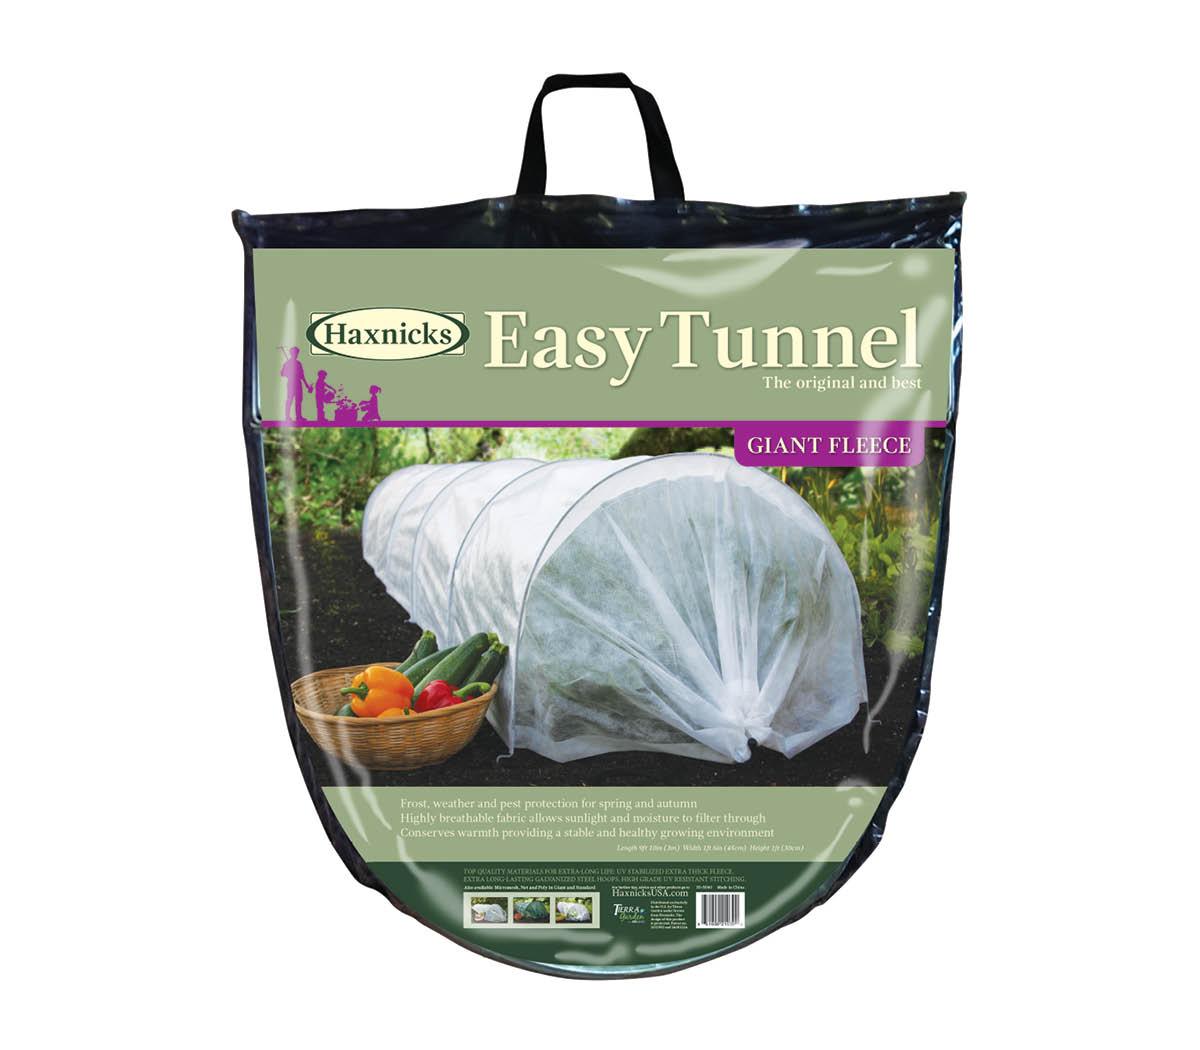 Haxnicks Giant Fleece Easy Tunnel.jpg